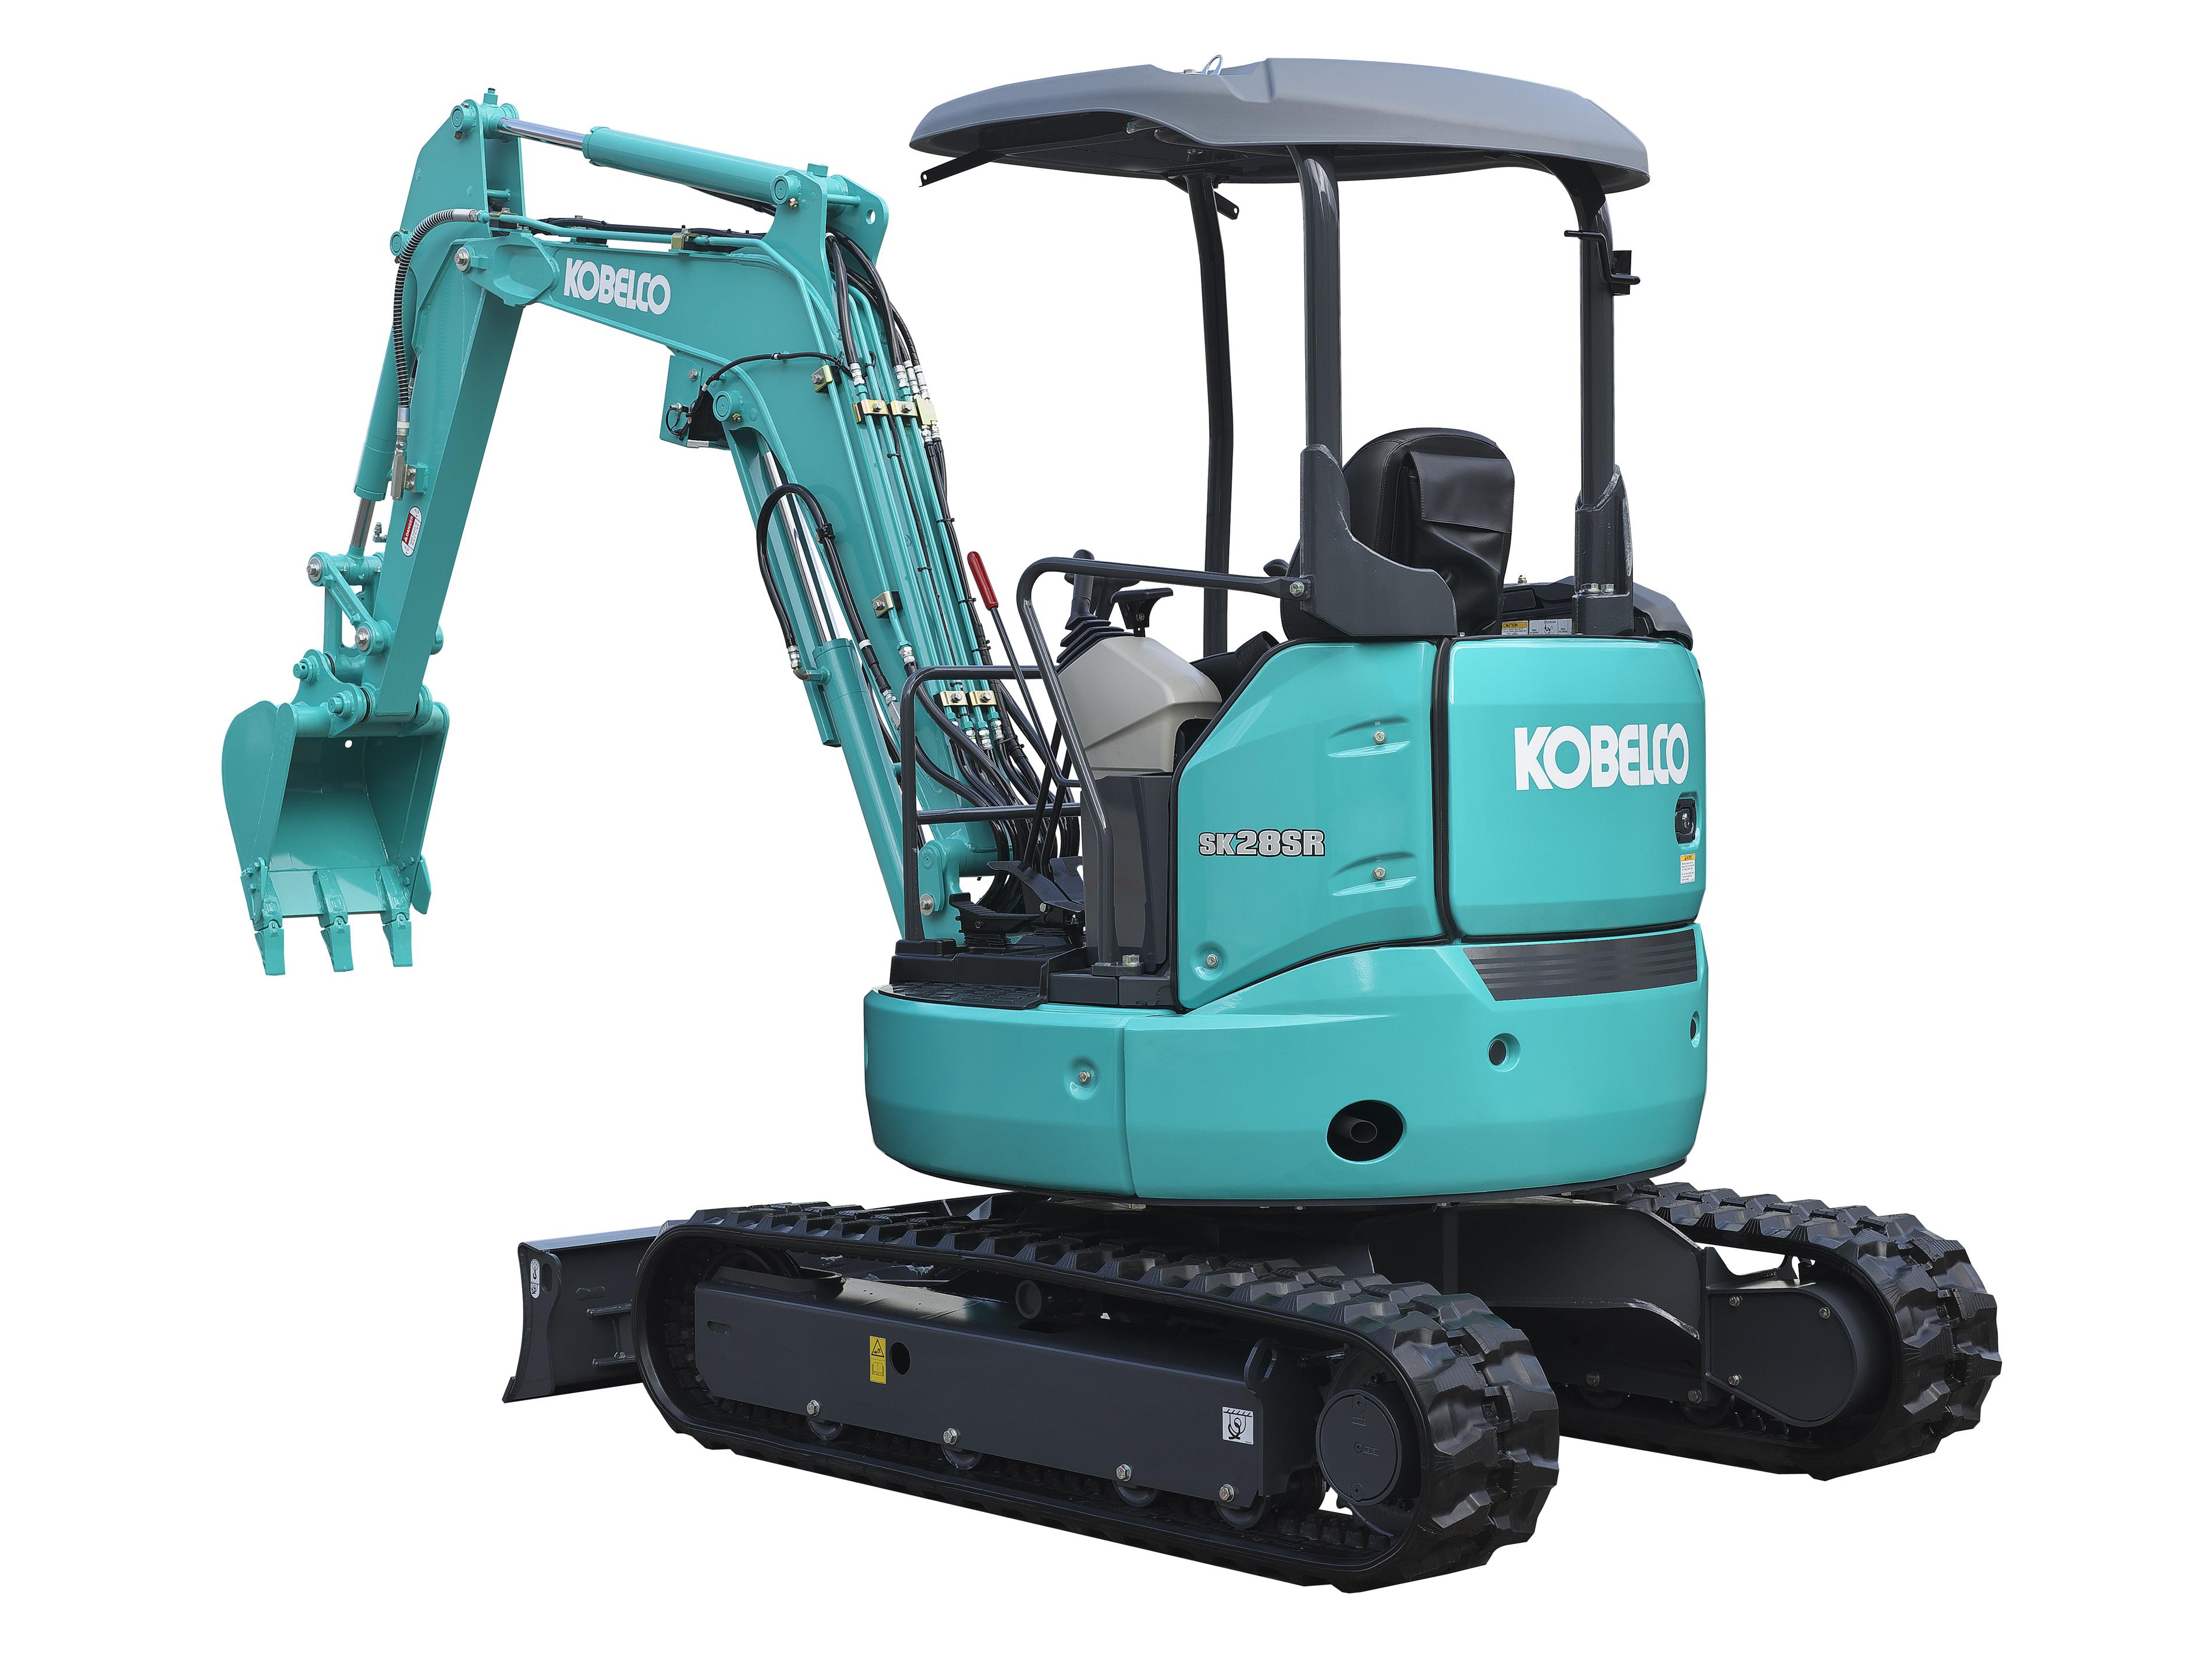 Kobelco Sk 28 Sr 6 Excavator Specs 2016 2018 Diggers Lectura Specs